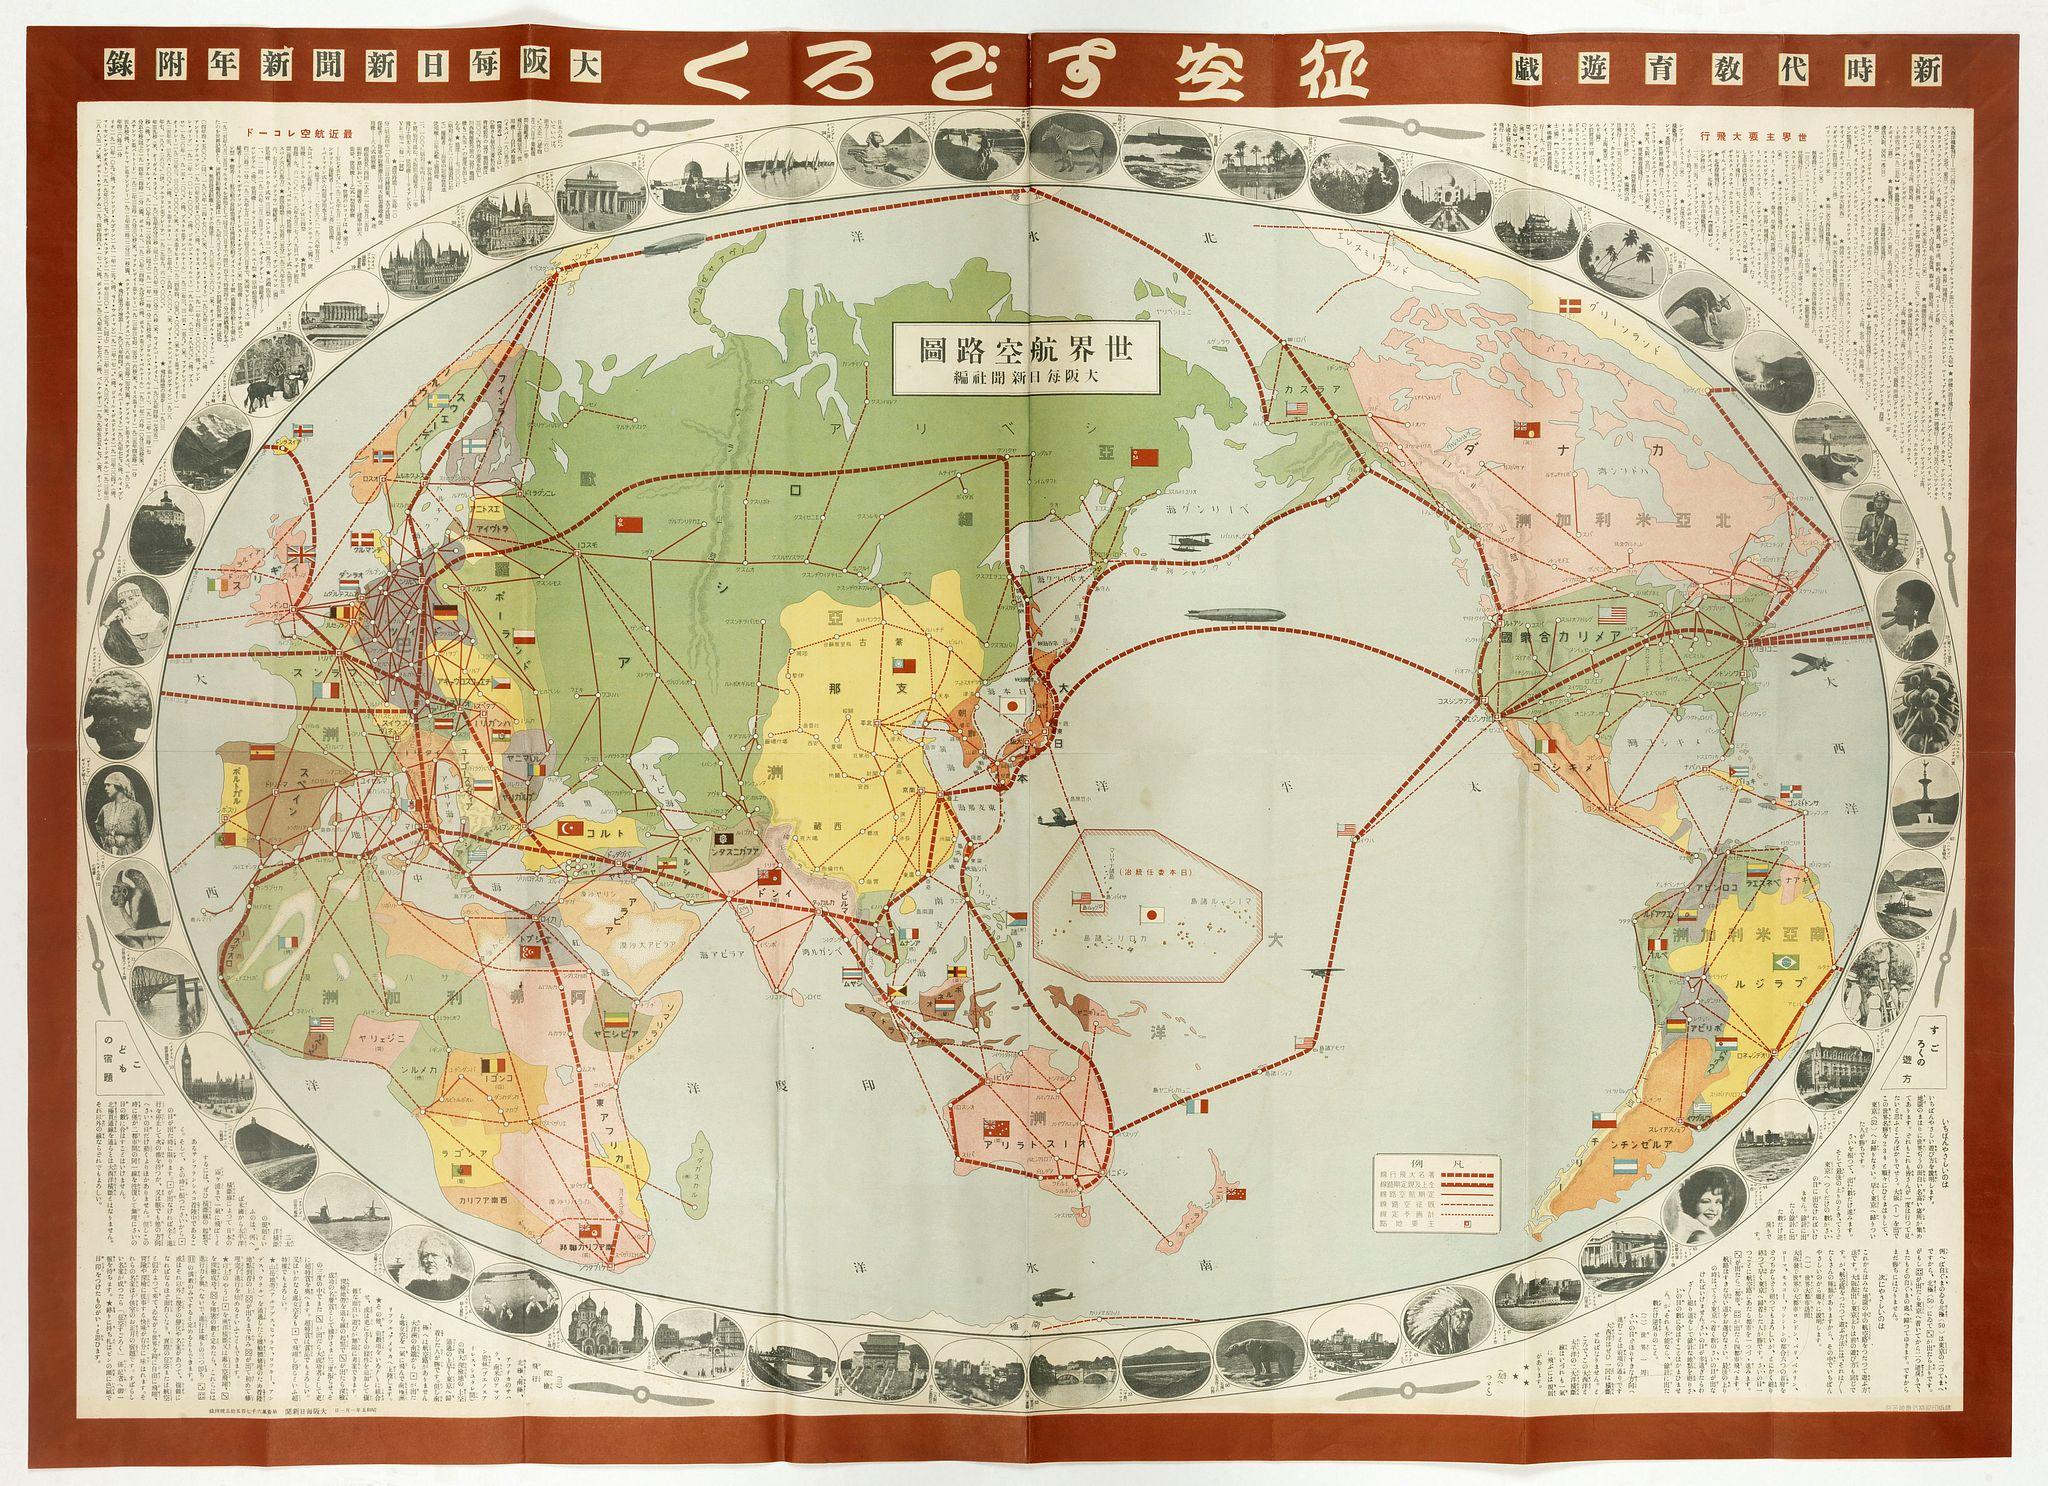 OSAKA MAINICHI SHINBUN -  World Flight Routes (all in Japanese).